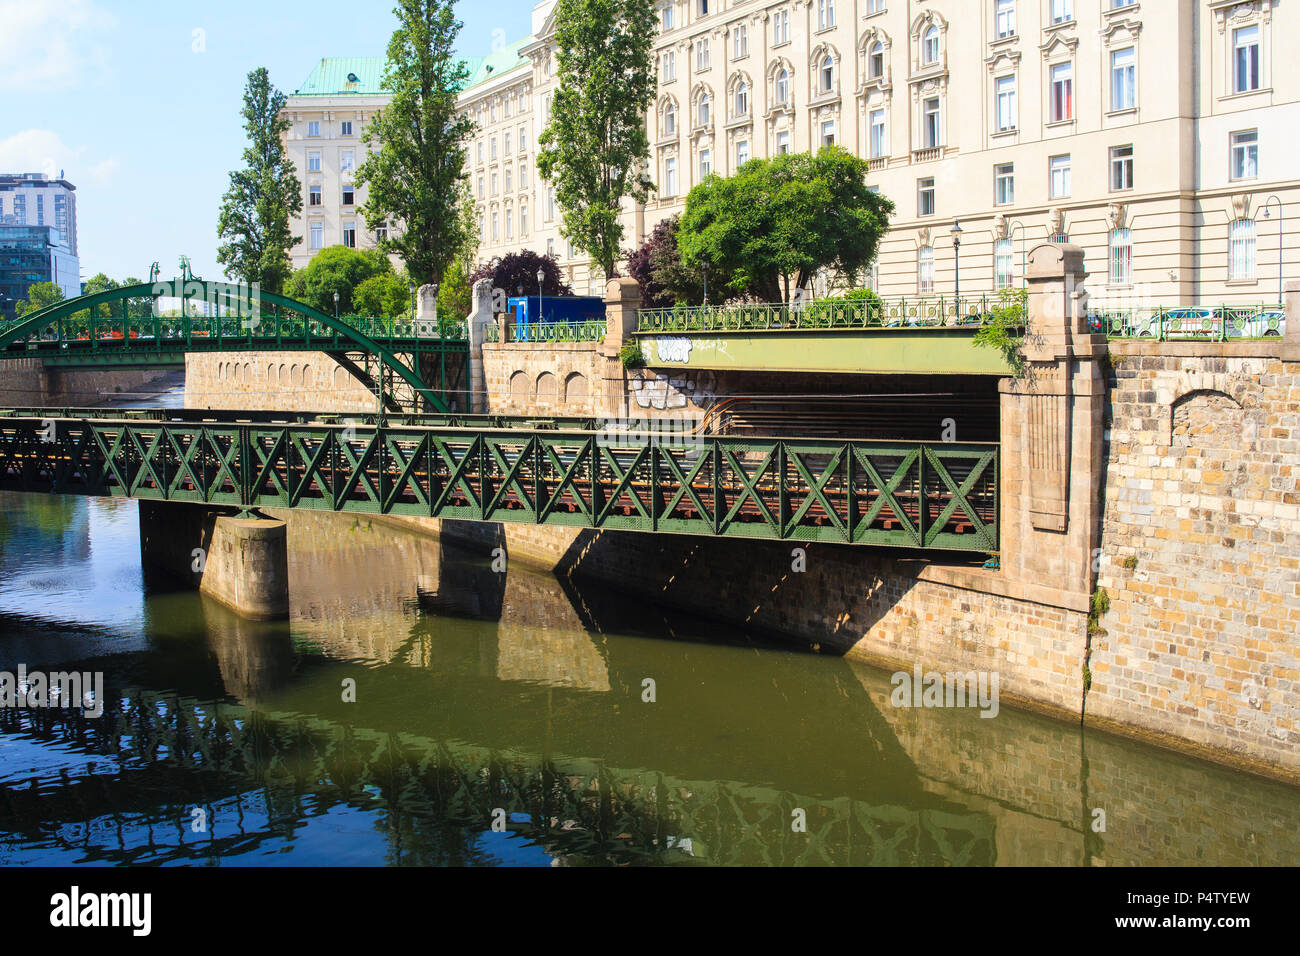 View Of The Art Nouveau Bridge Over The Railway Vienna Austria Stock Photo Alamy